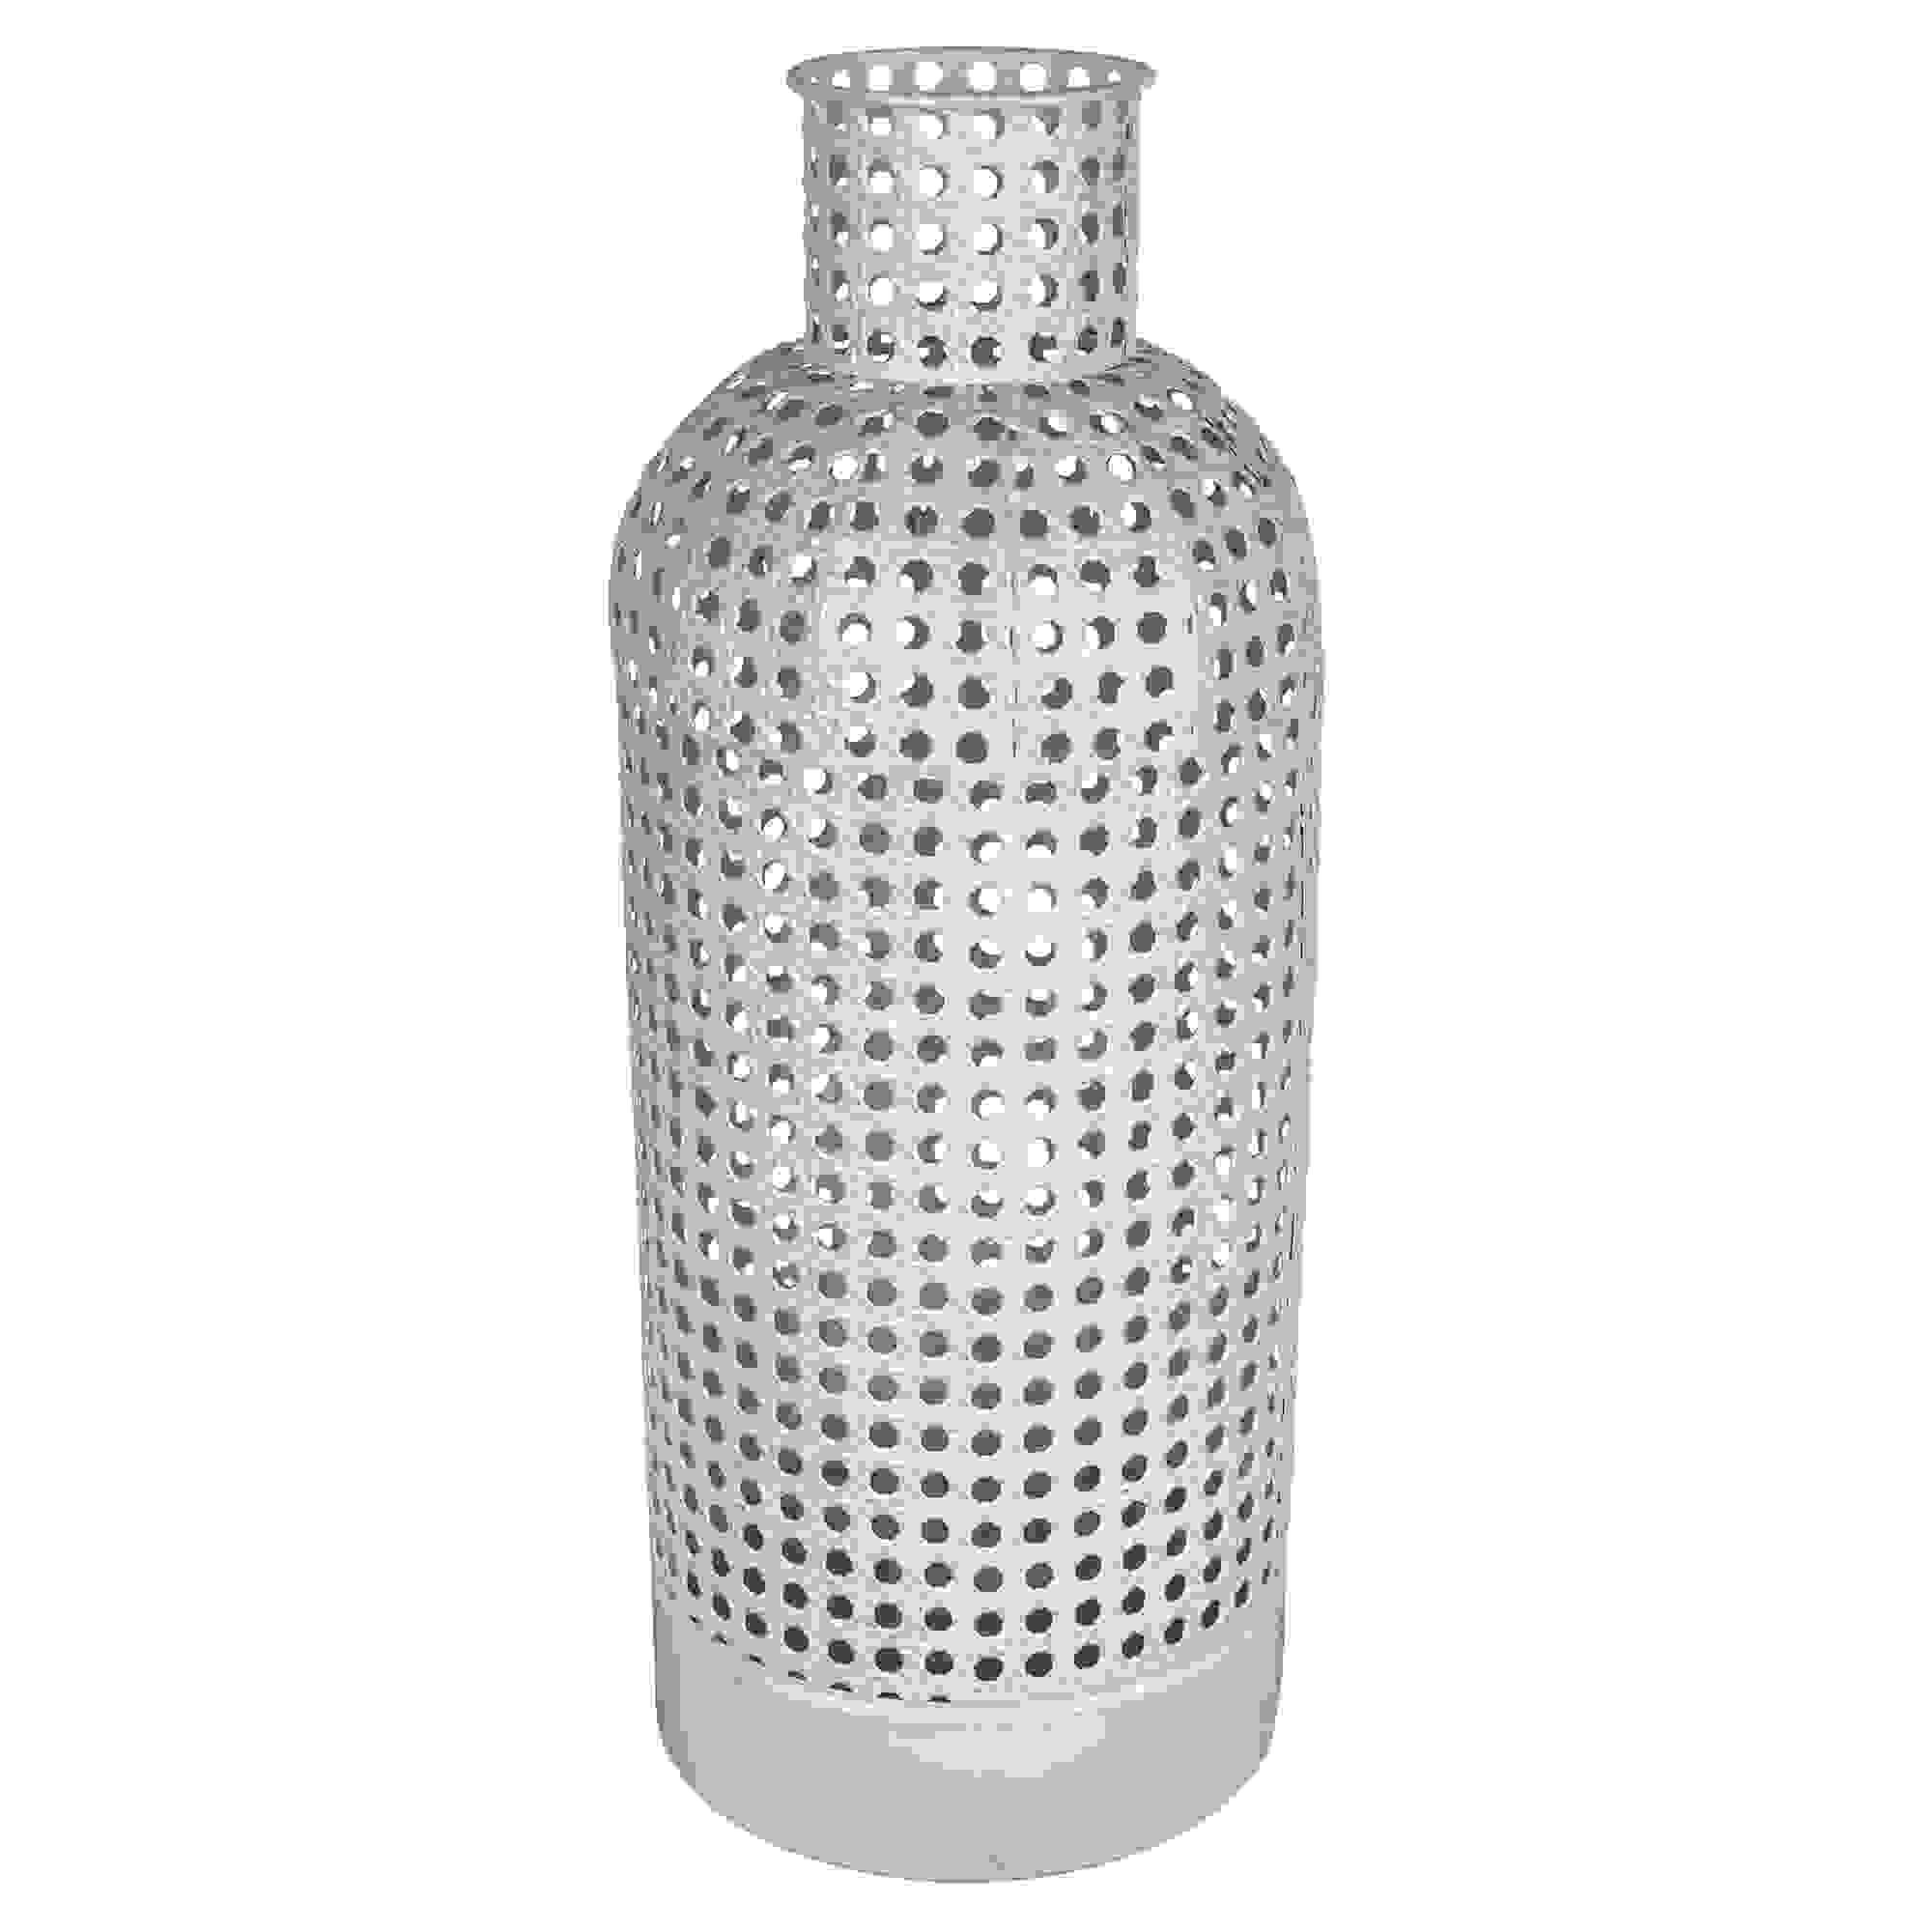 Stratton Home Decor Large Metal Cane Webb Vase